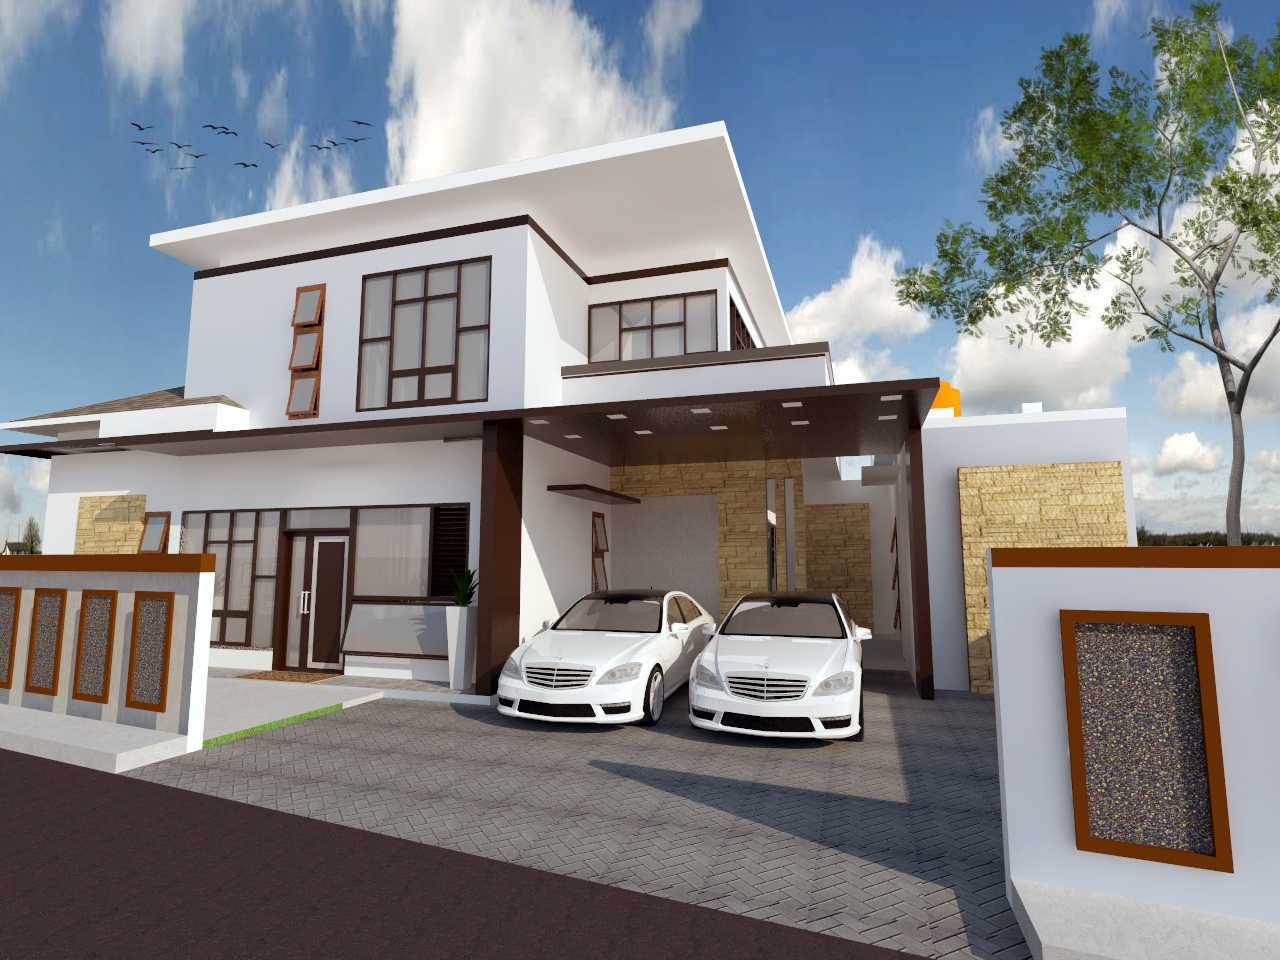 Archdesignbuild7 Project Rumah Tinggal 2 Lantai  Cimekar, Jatihandap Bandung Cimekar, Jatihandap Bandung Car Garage Modern  13442